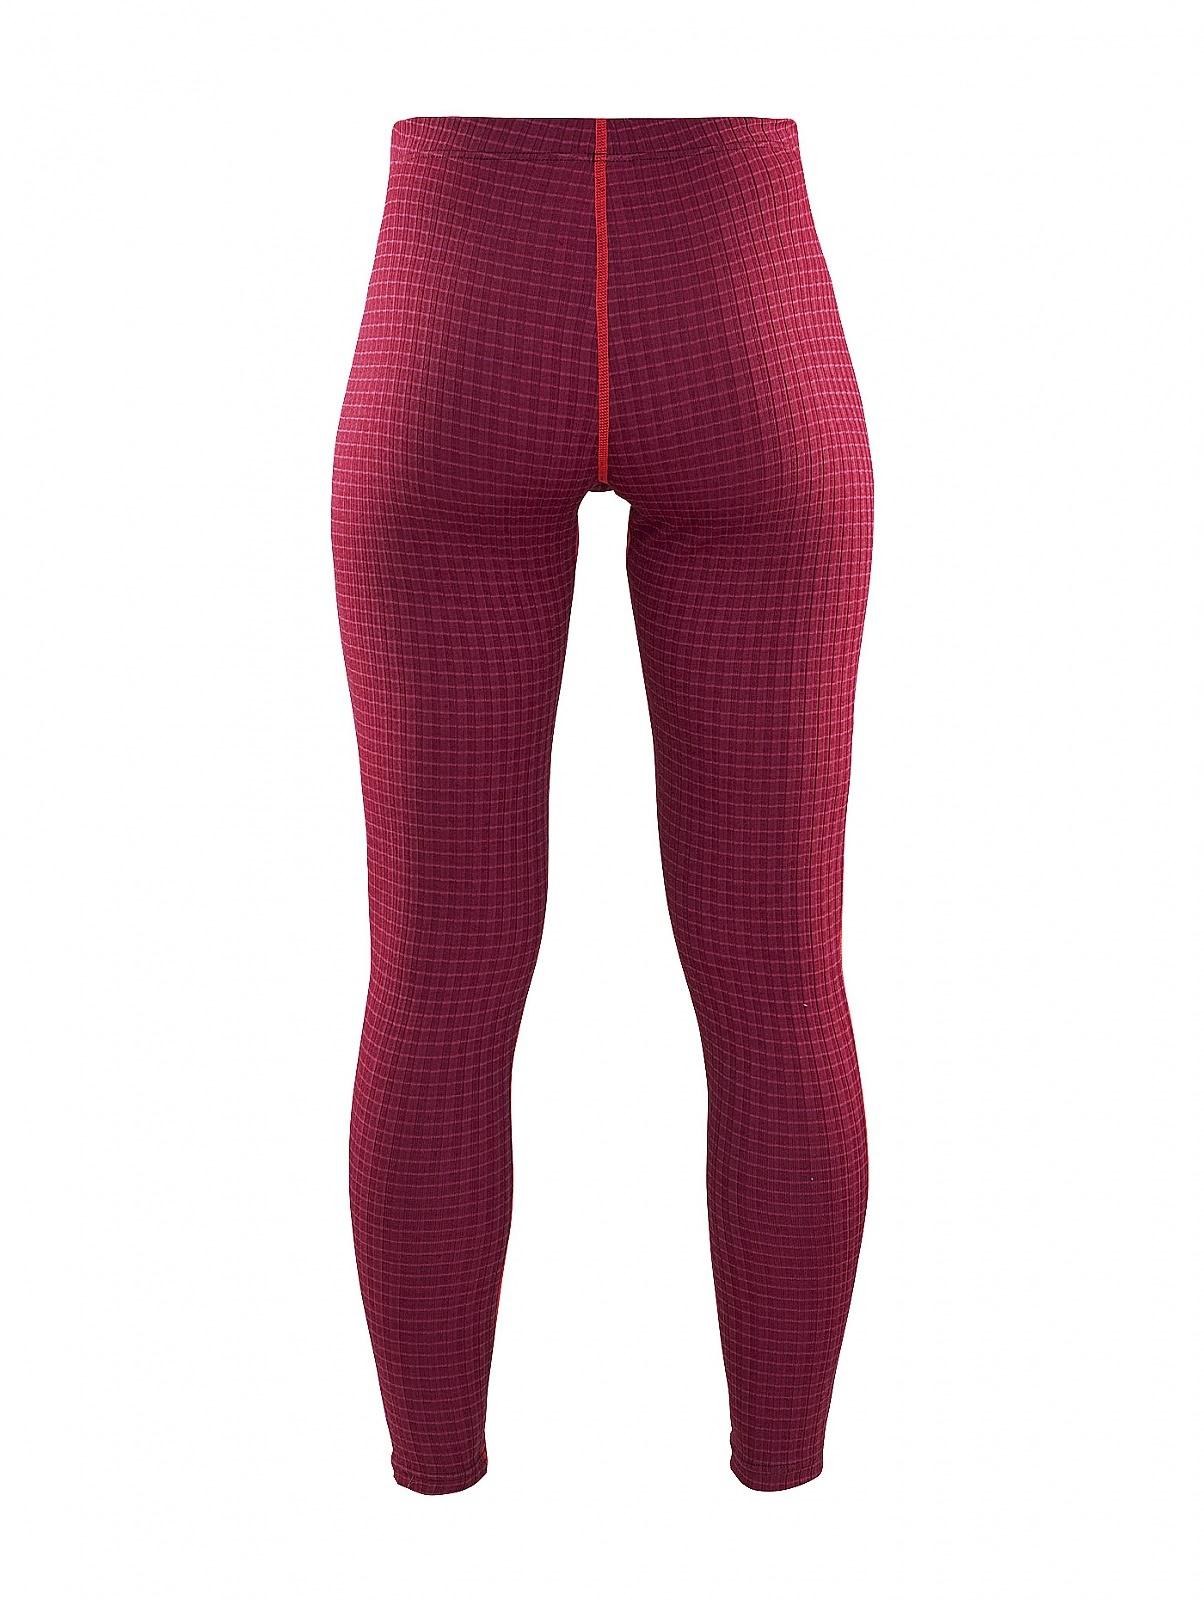 Женское термобелье кальсоны крафт Warm Wool Red (1903725-2482)